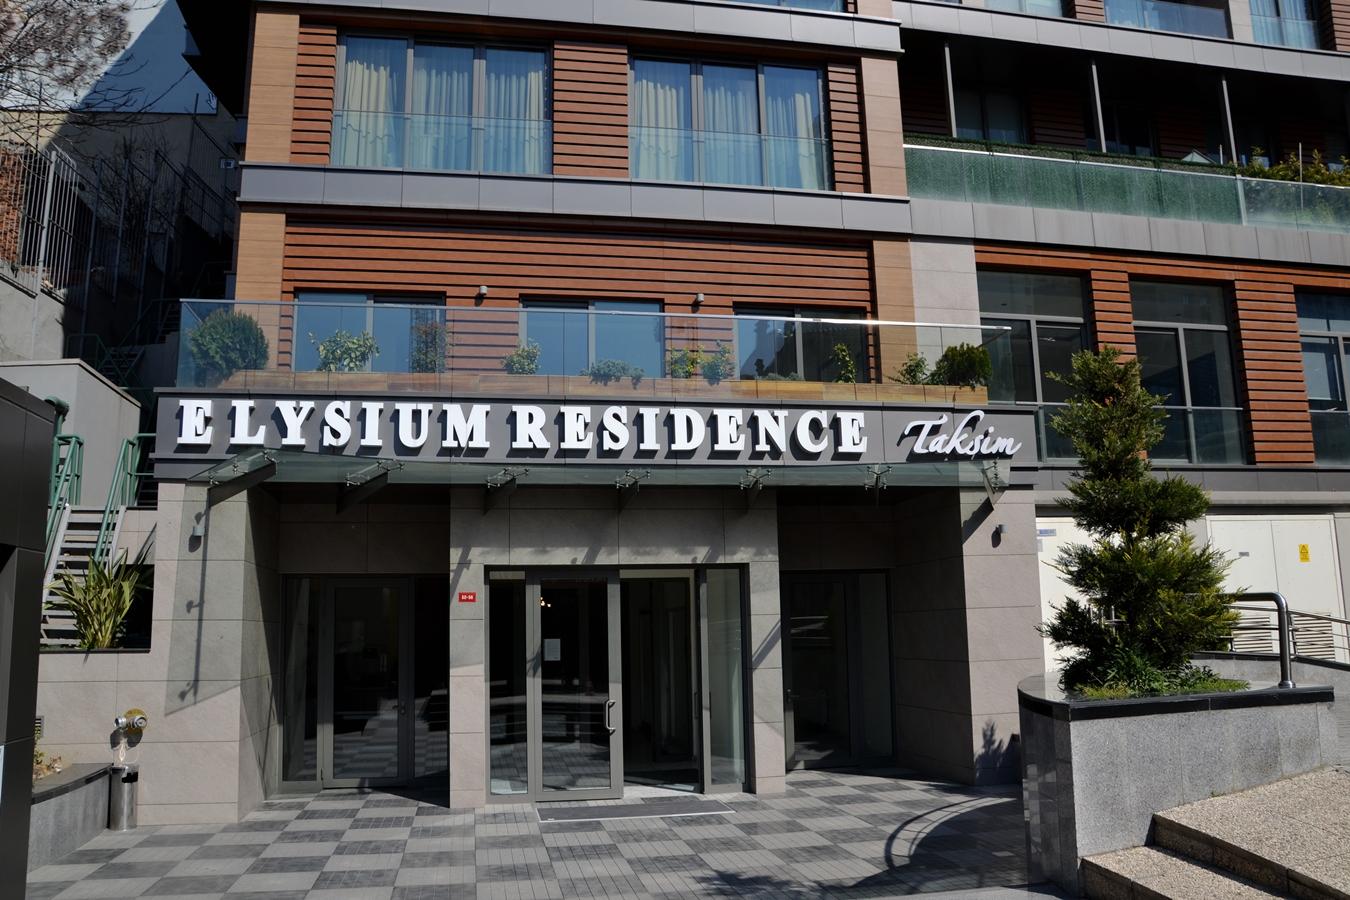 Taksim Hotel in Istanbul  The Elysium Istanbul Hotel